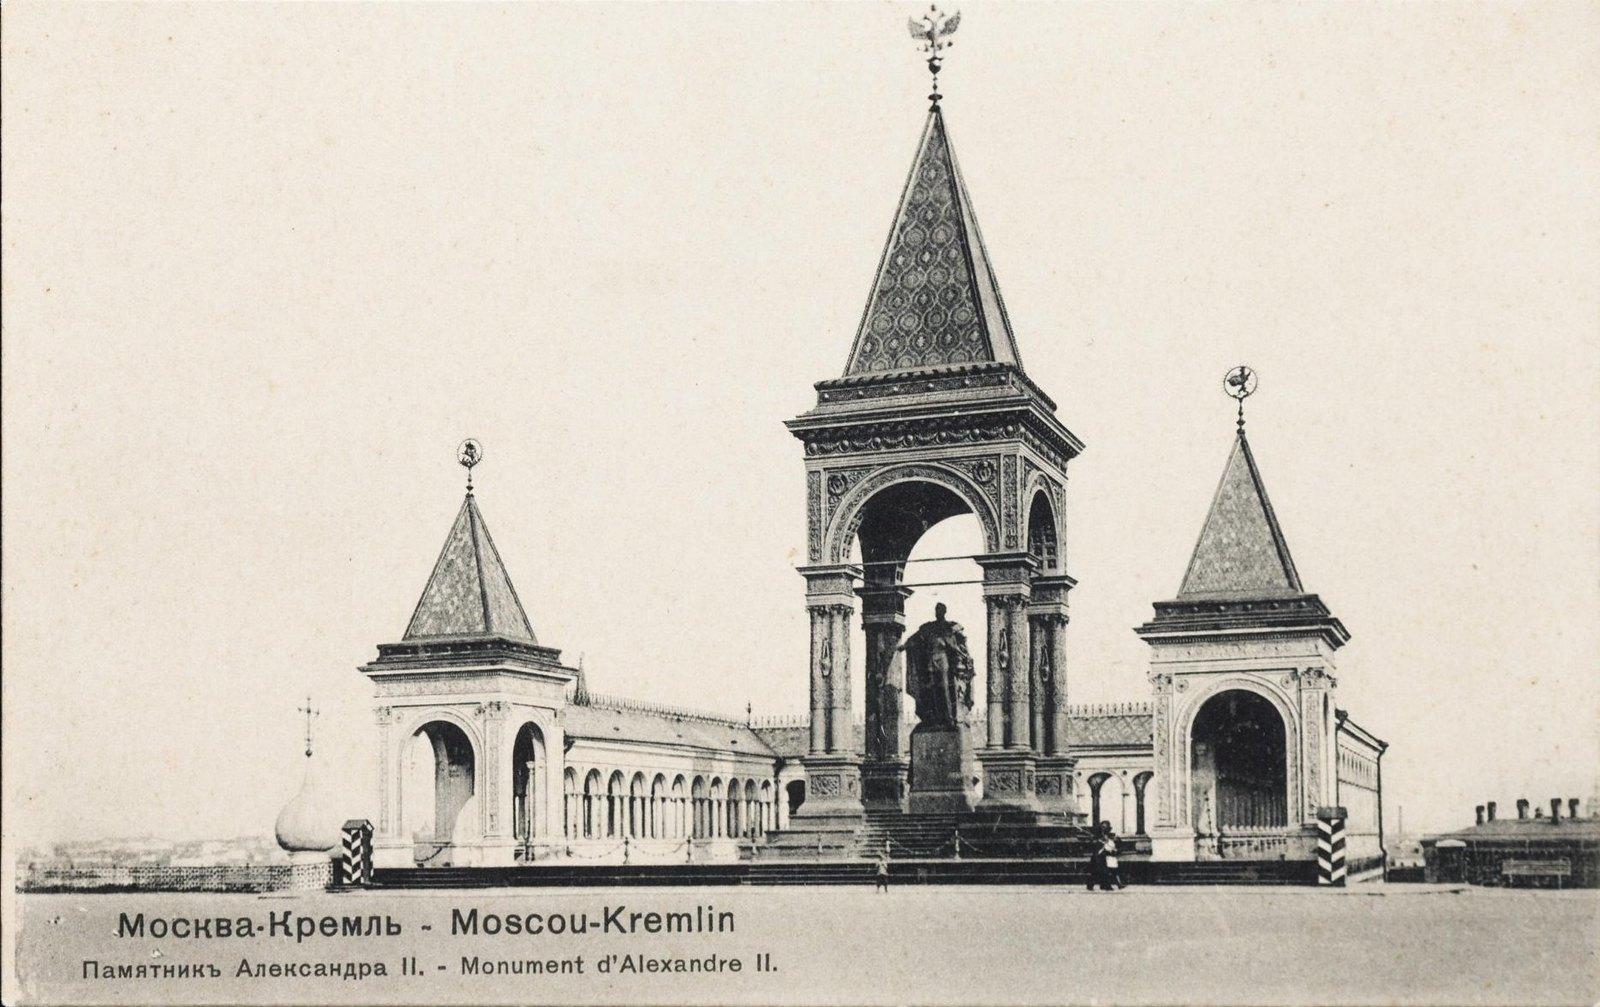 Общий вид памятника Александра II в Кремле от Малого Николаевского дворца